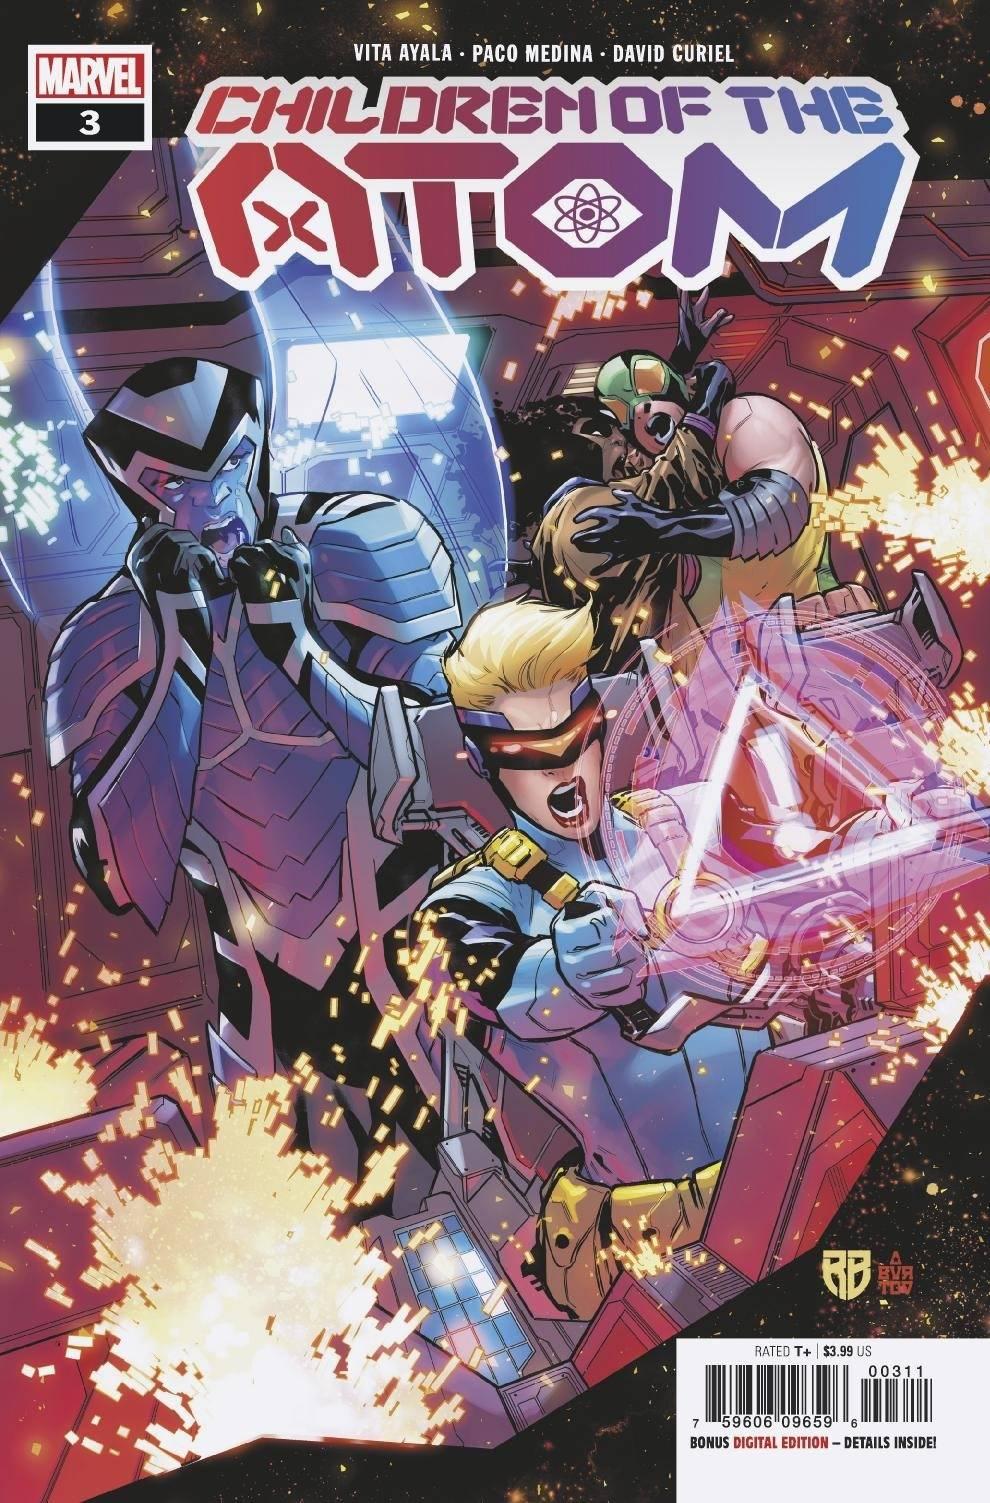 STL157144 ComicList: Marvel Comics New Releases for 05/12/2021